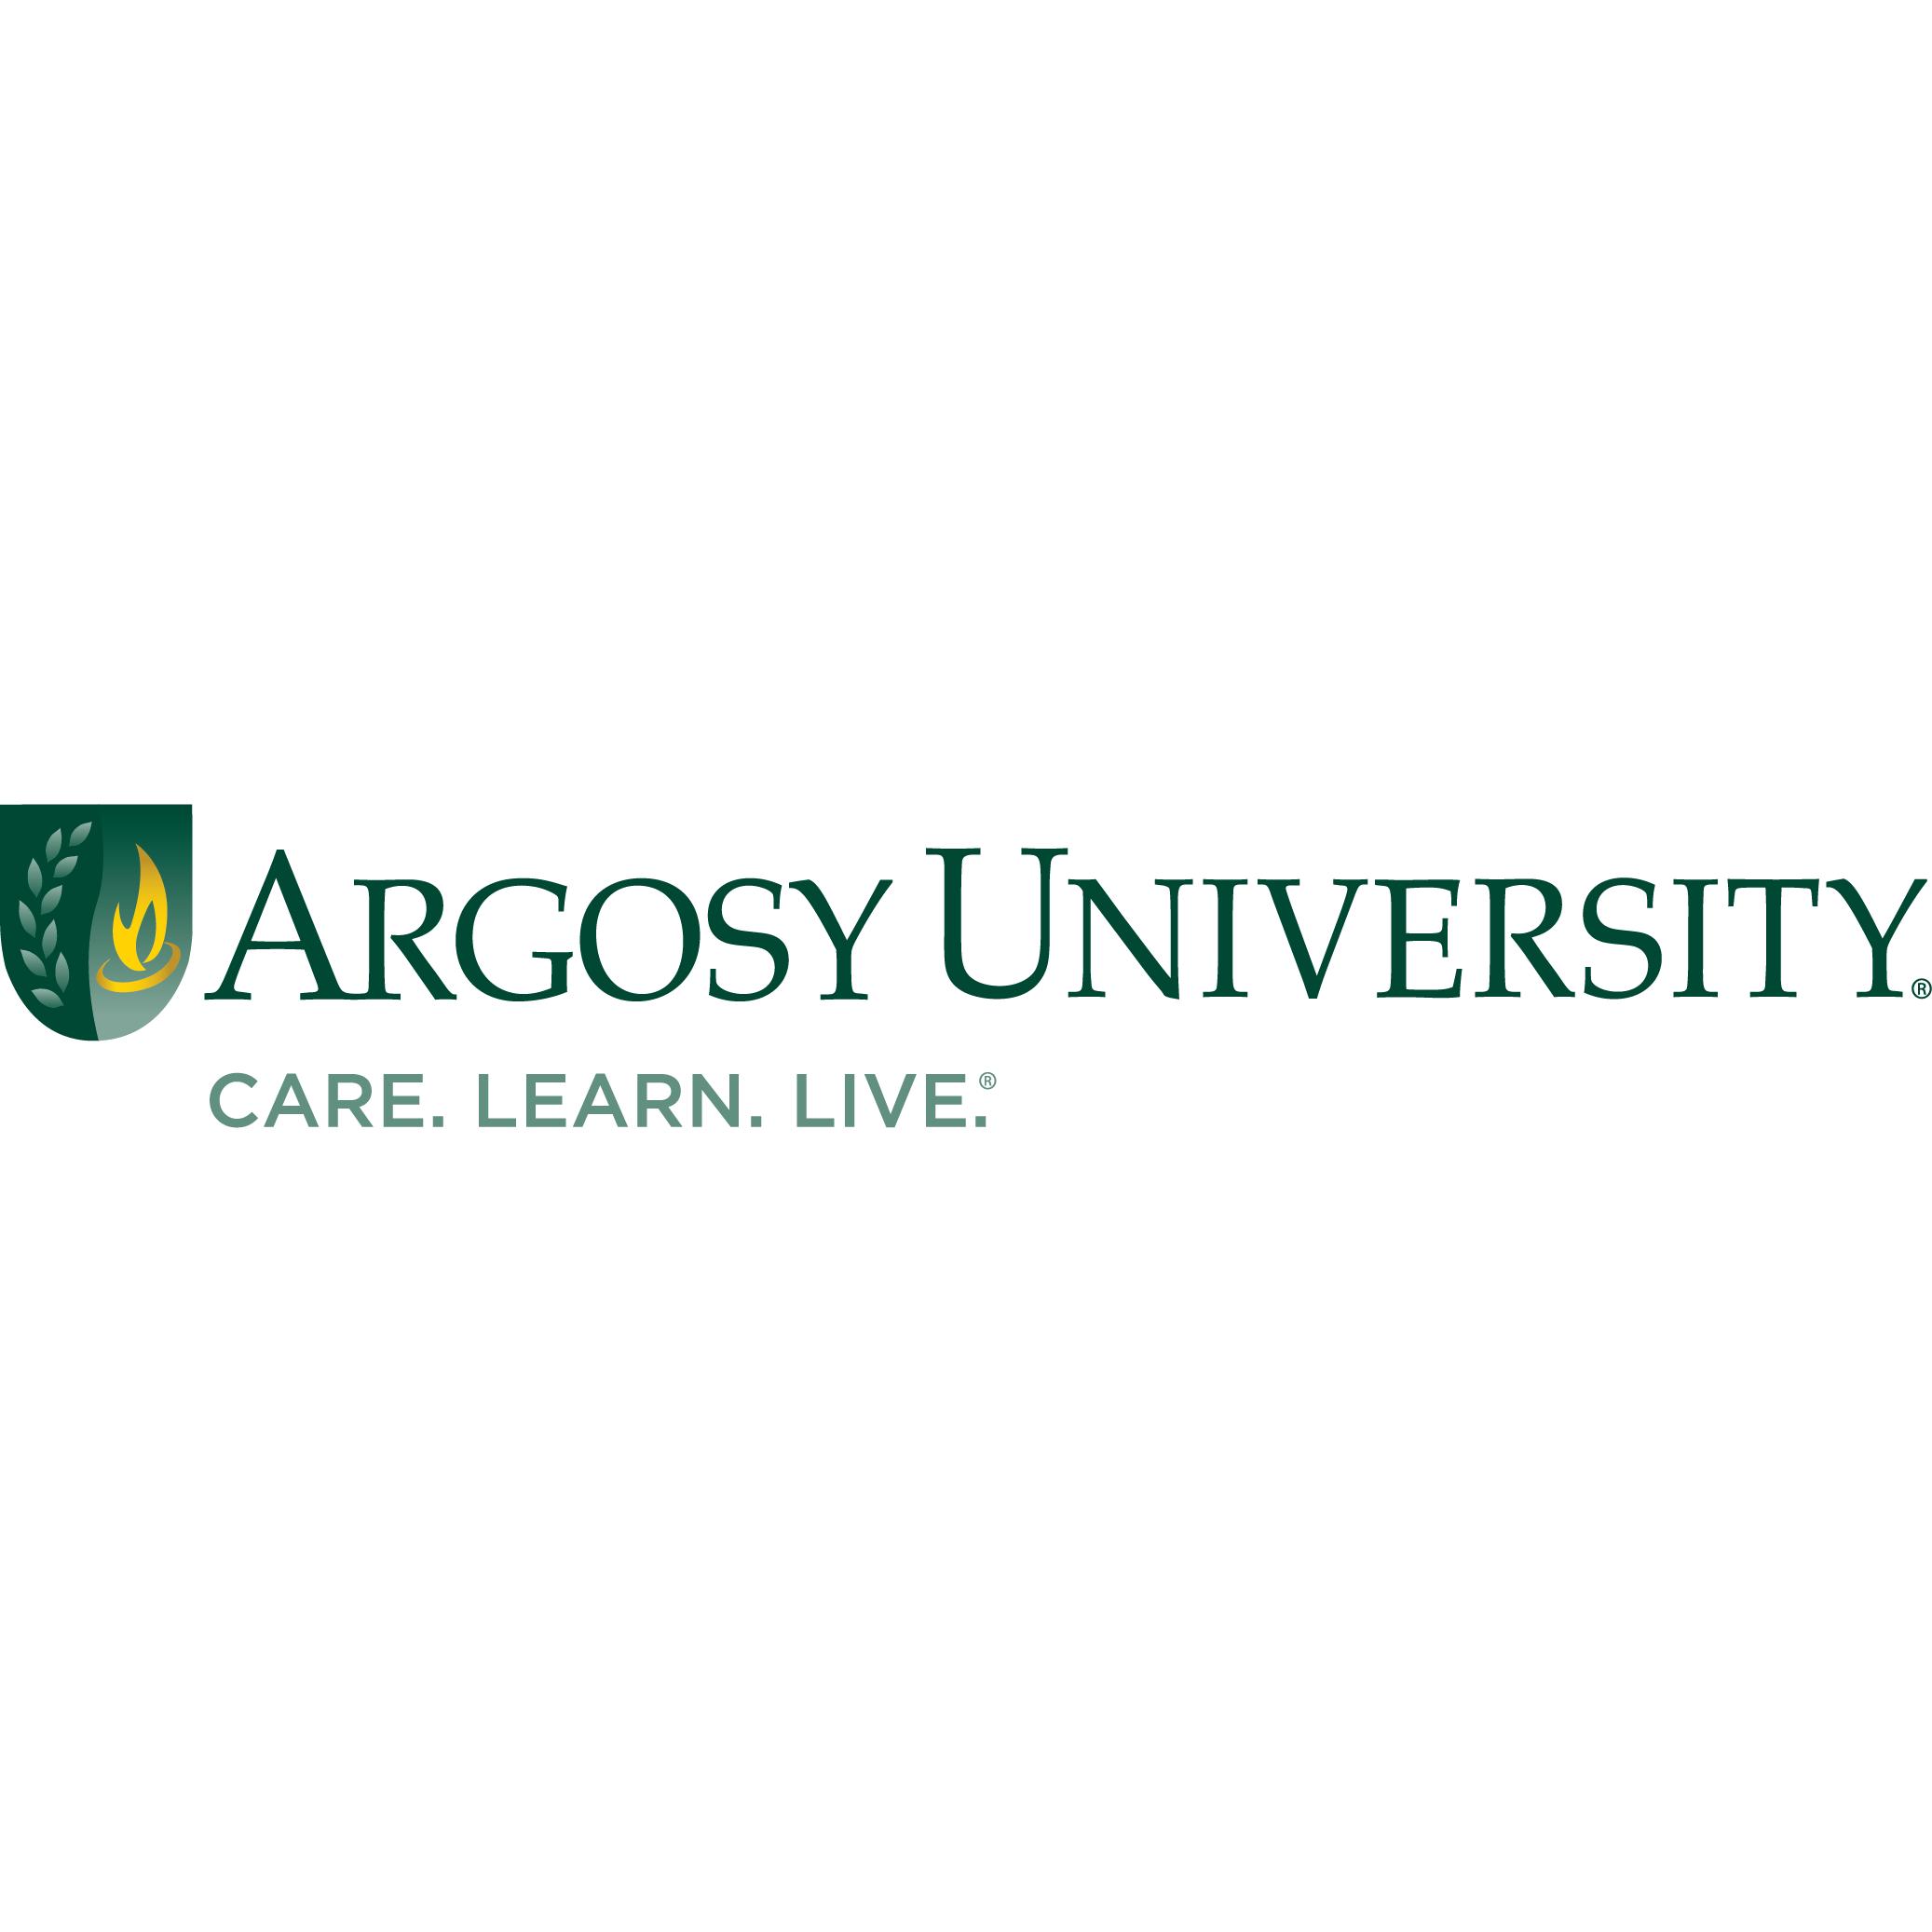 Argosy University, San Francisco Bay Area - Alameda, CA - Colleges & Universities